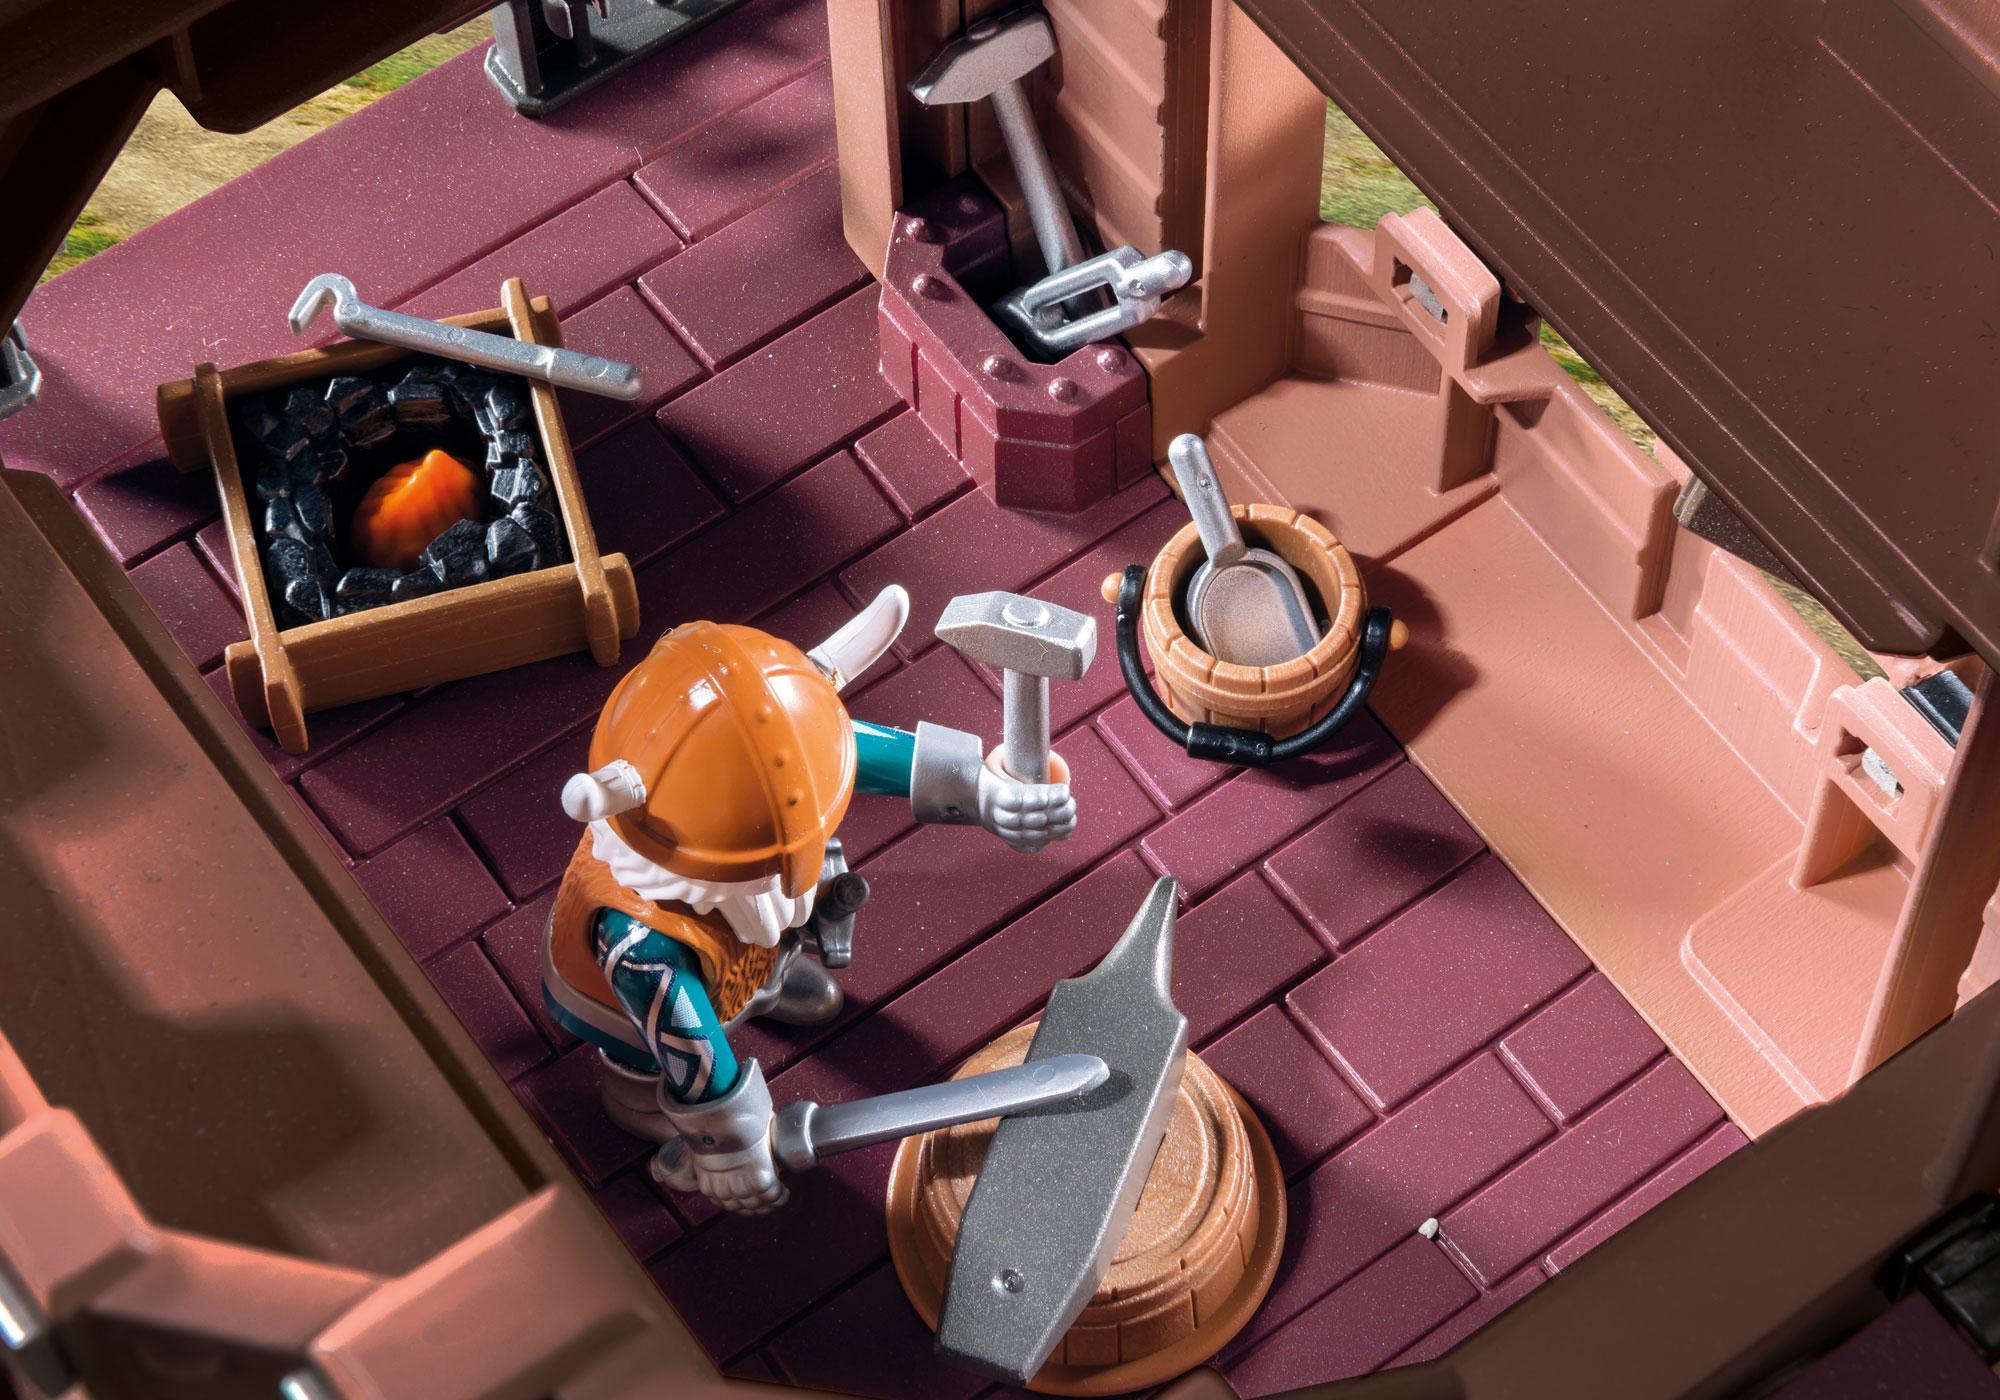 http://media.playmobil.com/i/playmobil/9340_product_extra4/Tour d'attaque mobile des nains